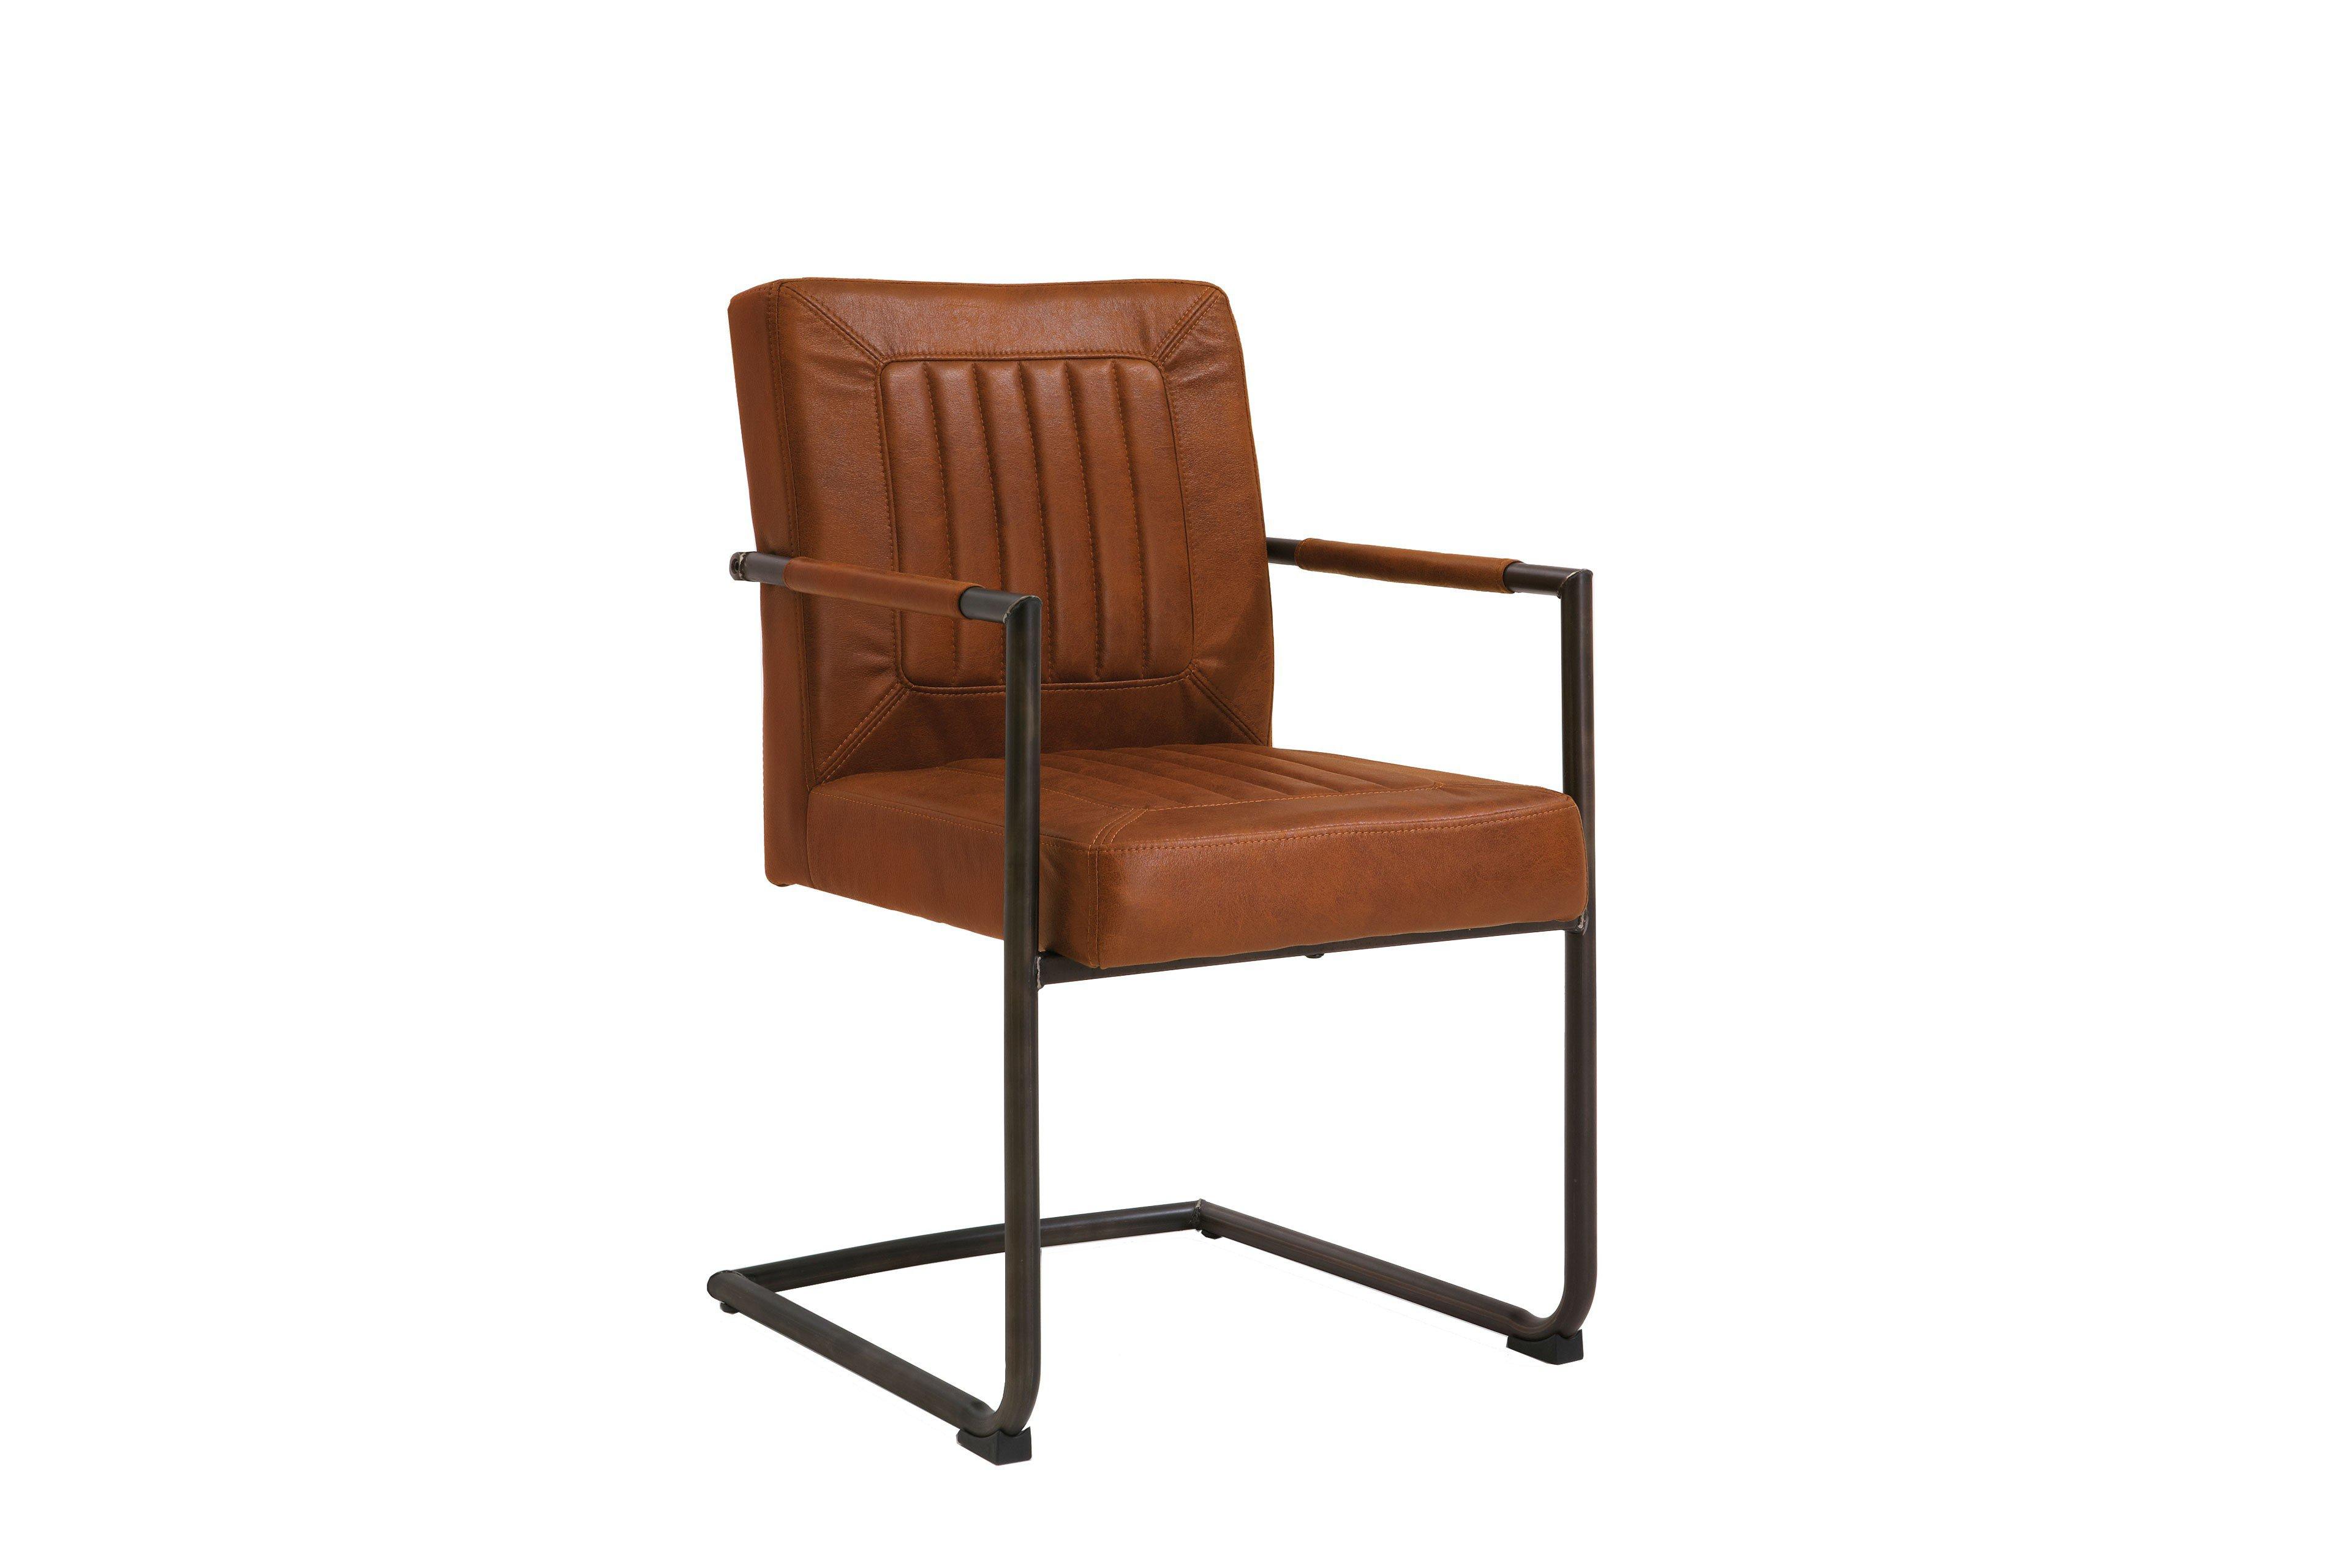 niehoff schwingstuhl lopez 2392 in braun m bel letz. Black Bedroom Furniture Sets. Home Design Ideas